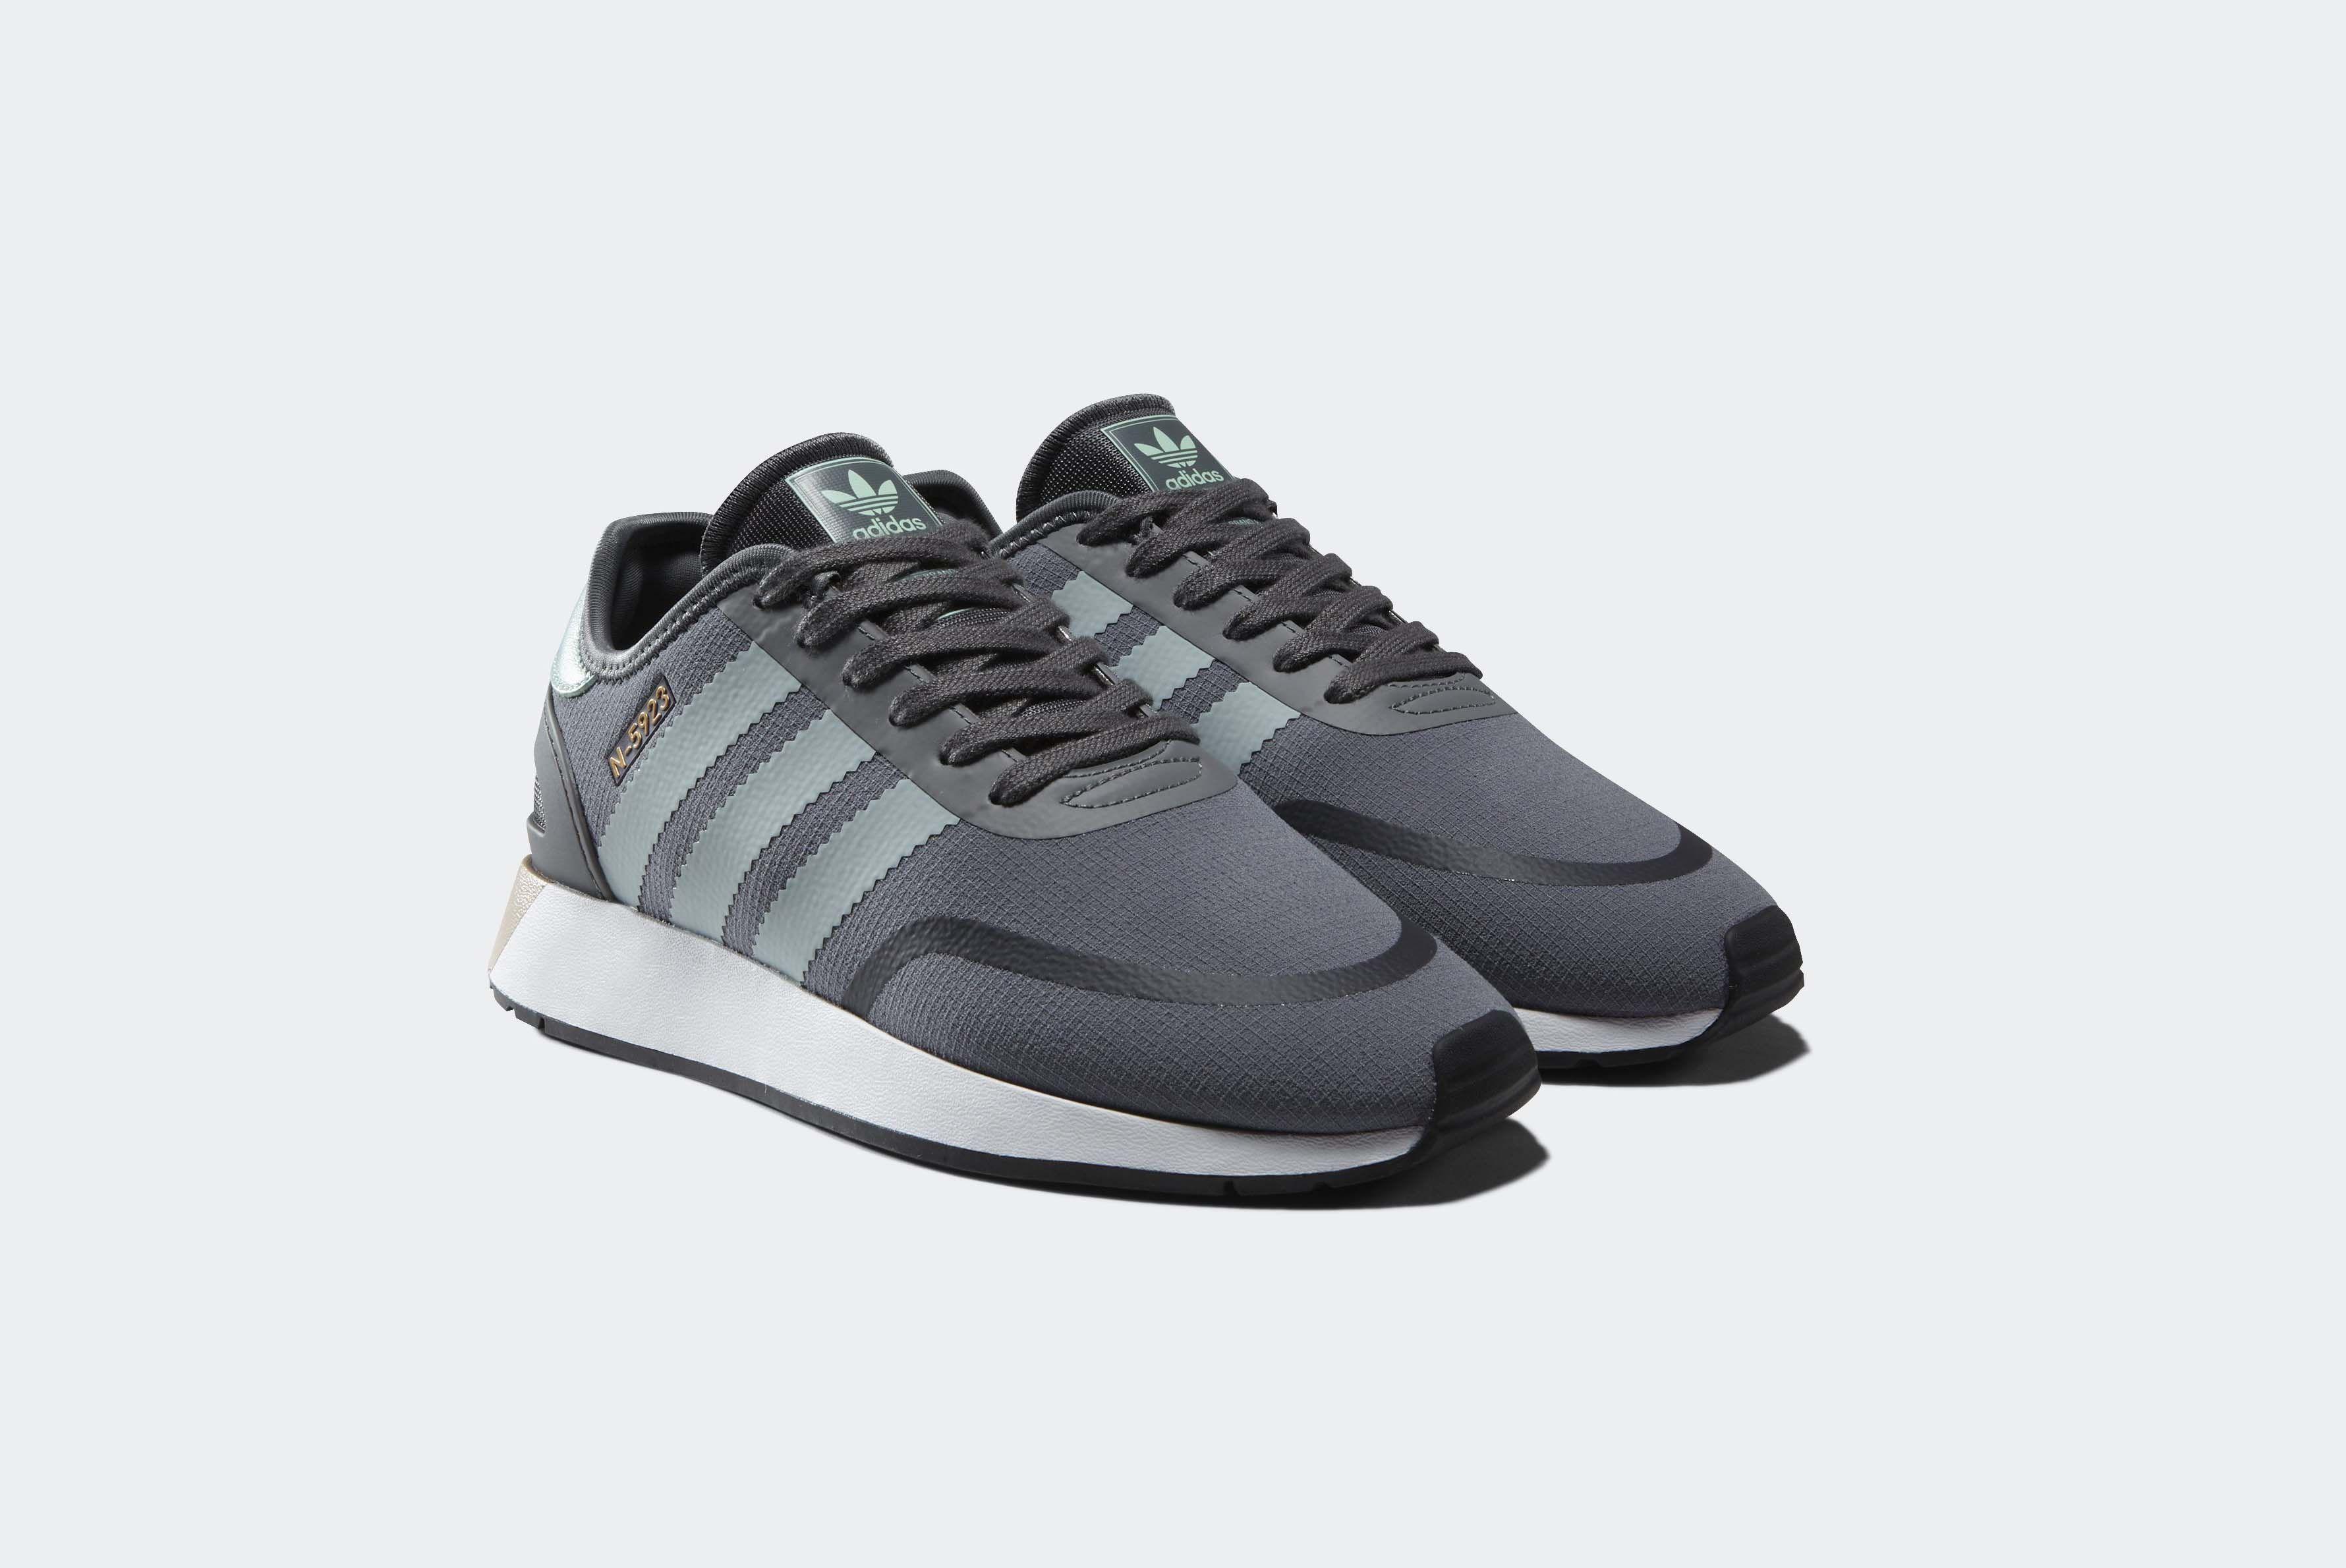 Adidas N 5923 5 E1521479420745 Sneaker Freaker